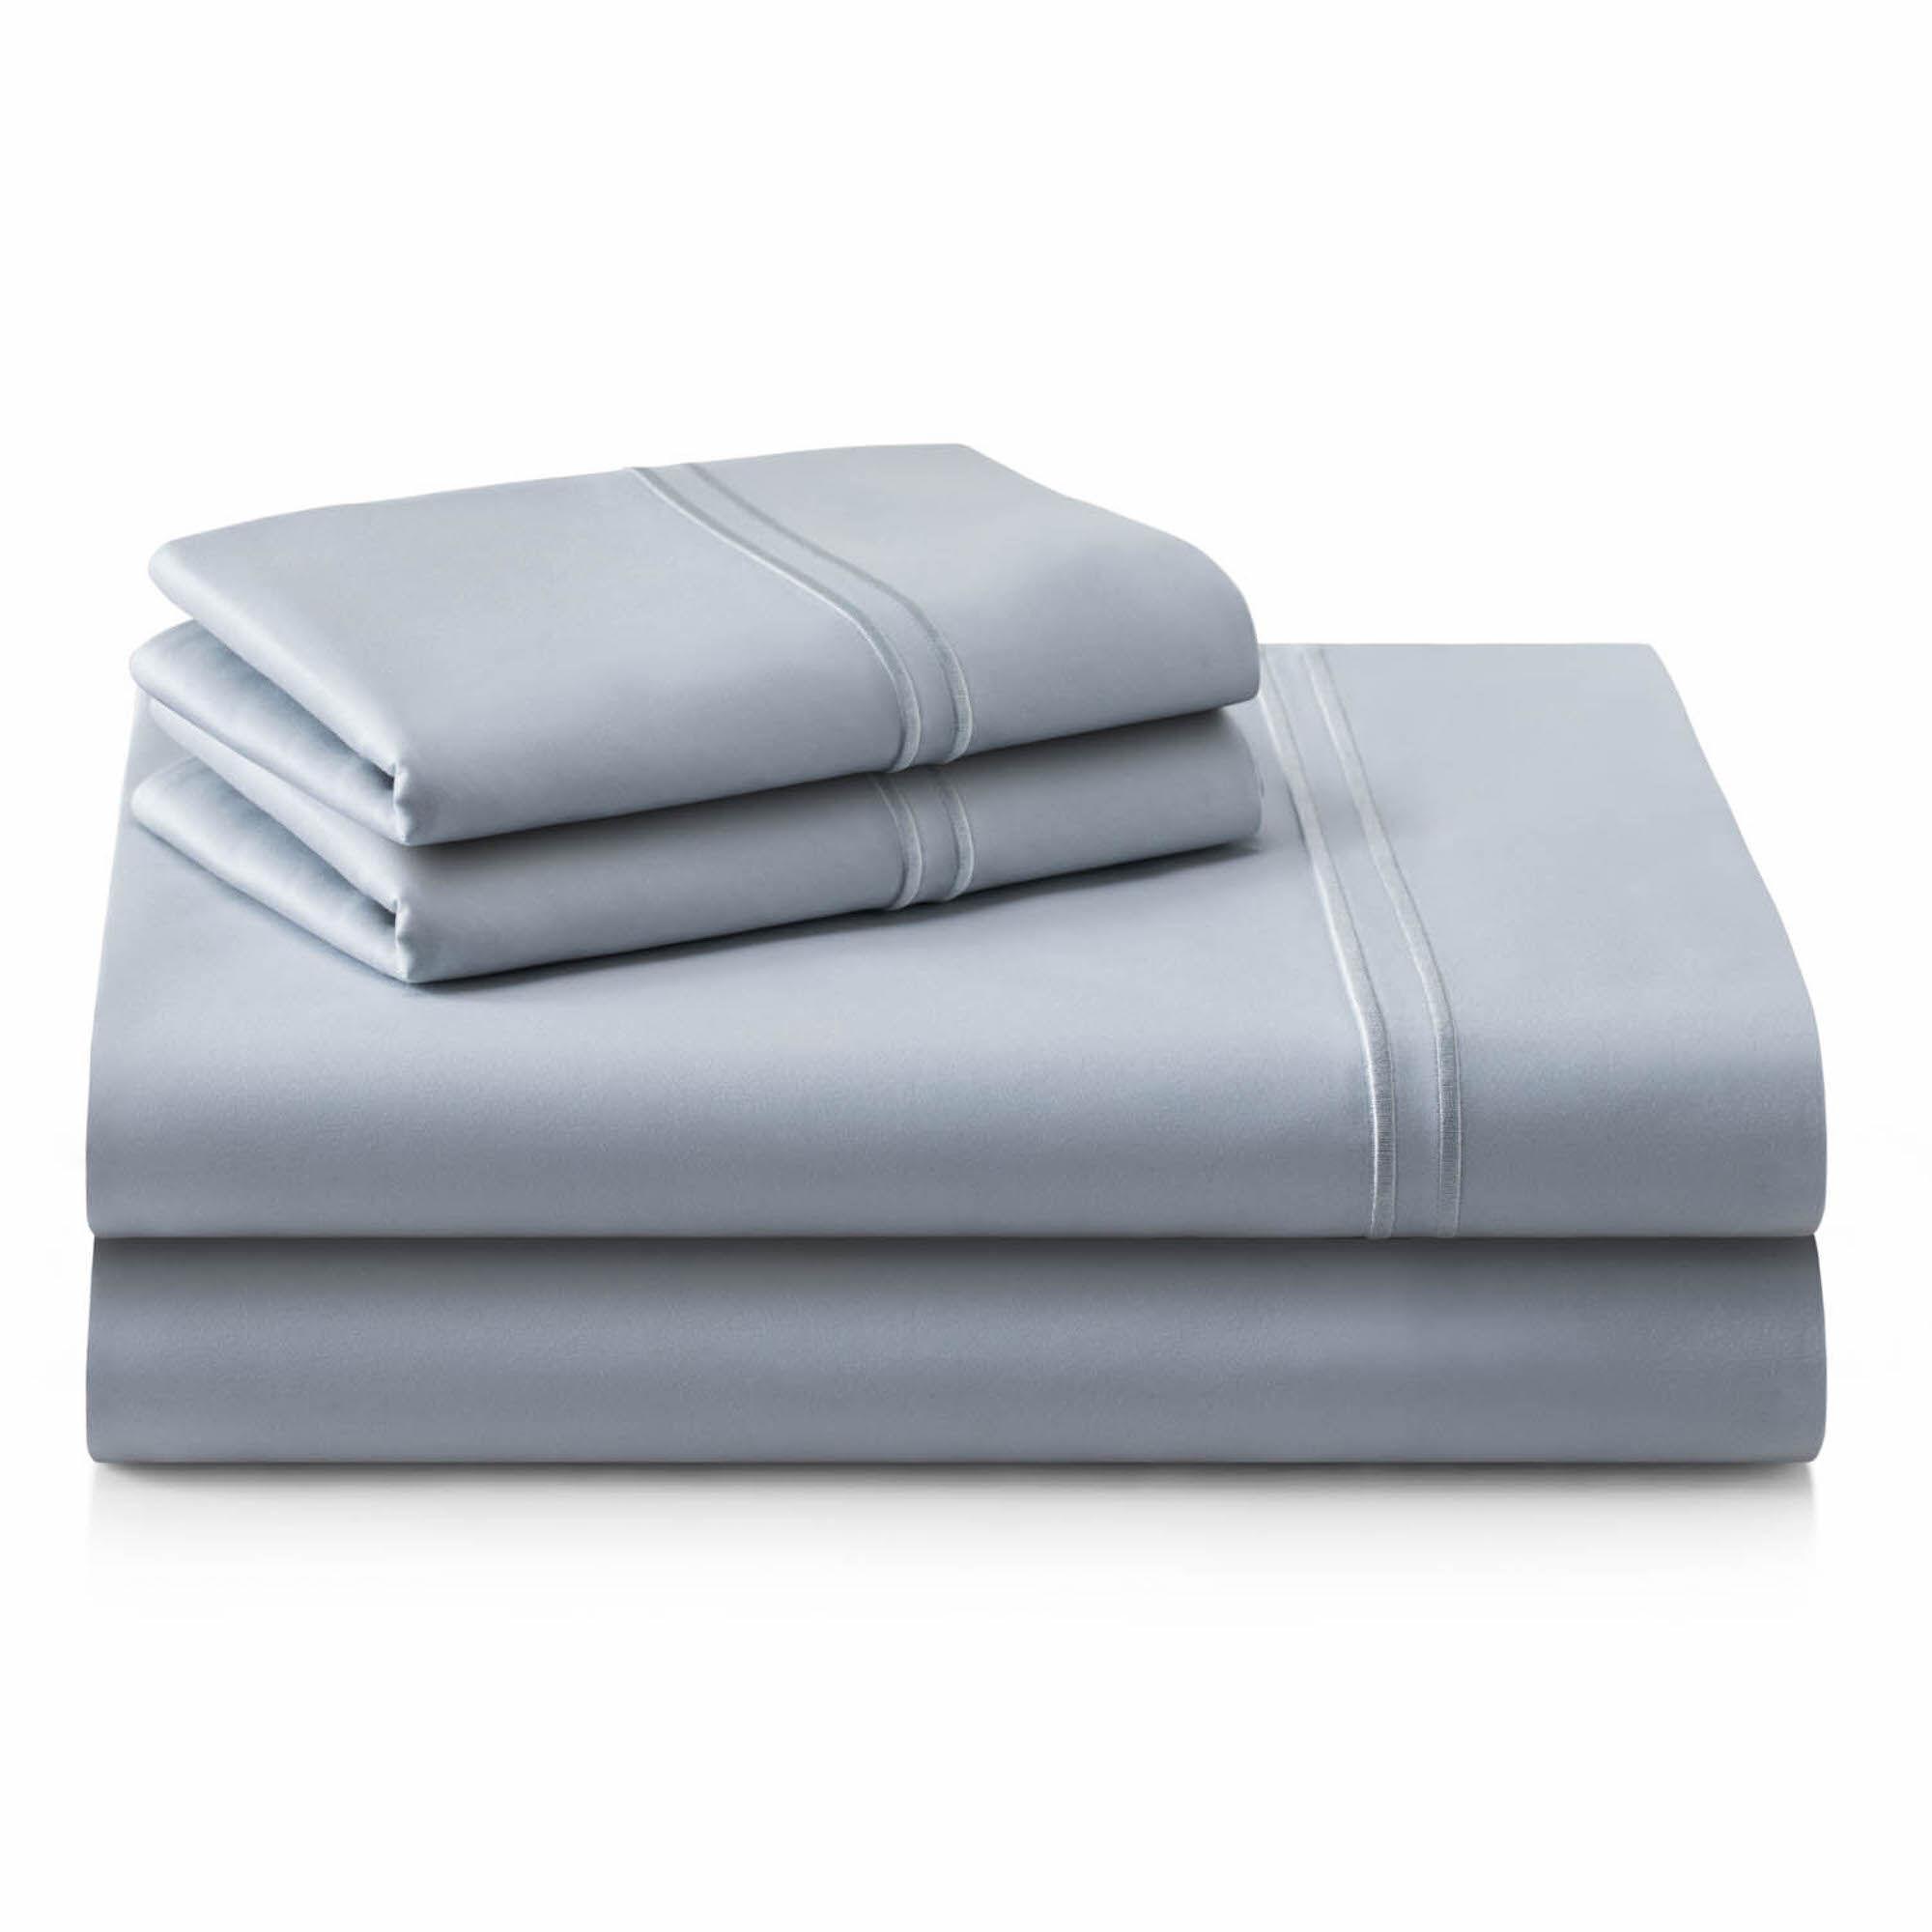 Malouf Supima Cotton Queen Sheet Set In Smoke ...